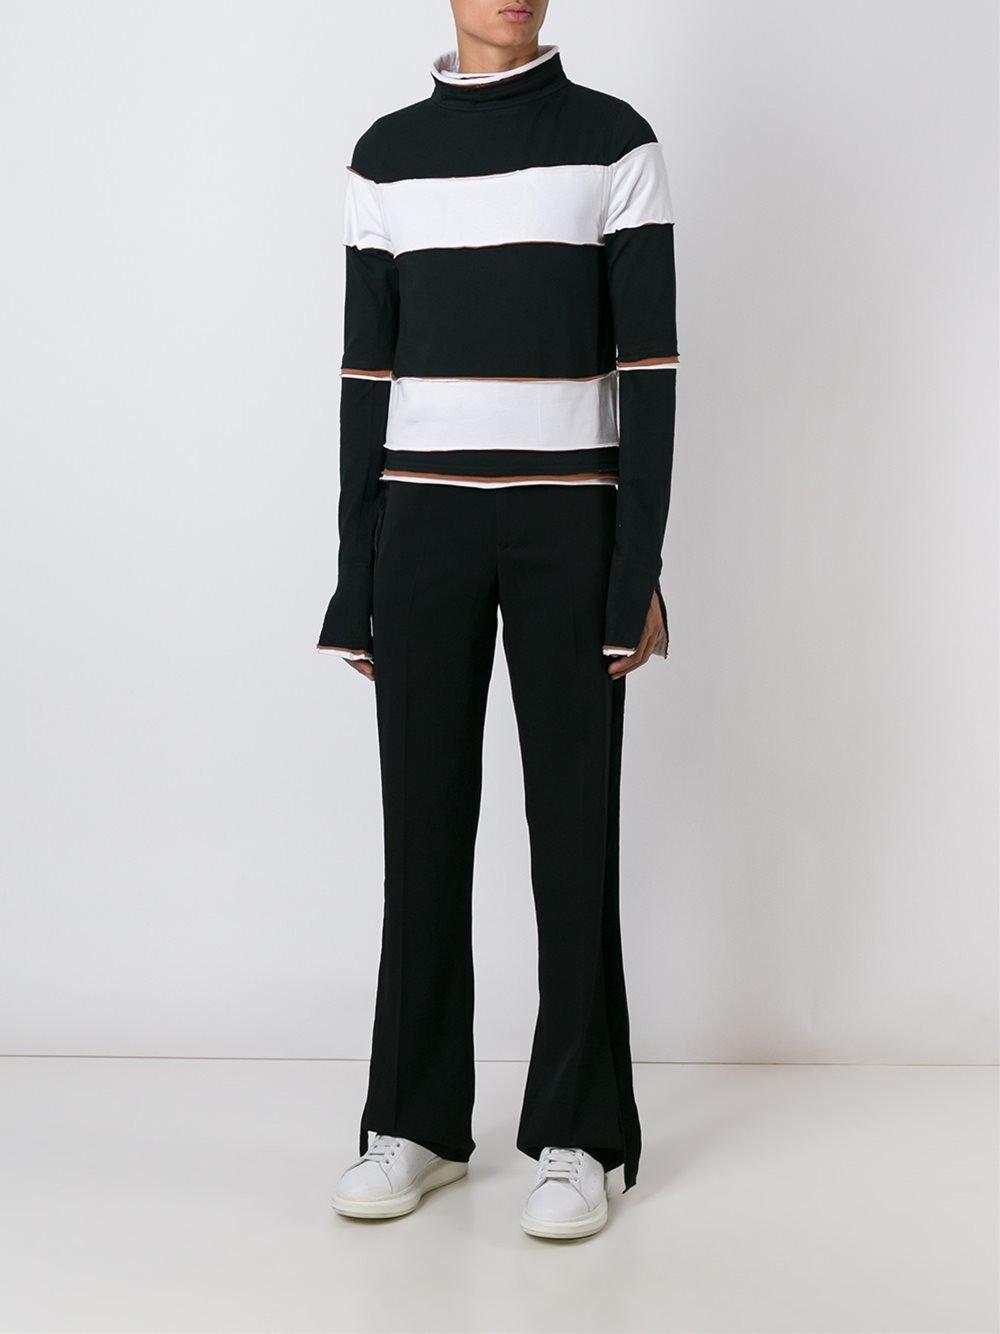 Telfar Cotton Striped Mock-neck Top in Black for Men